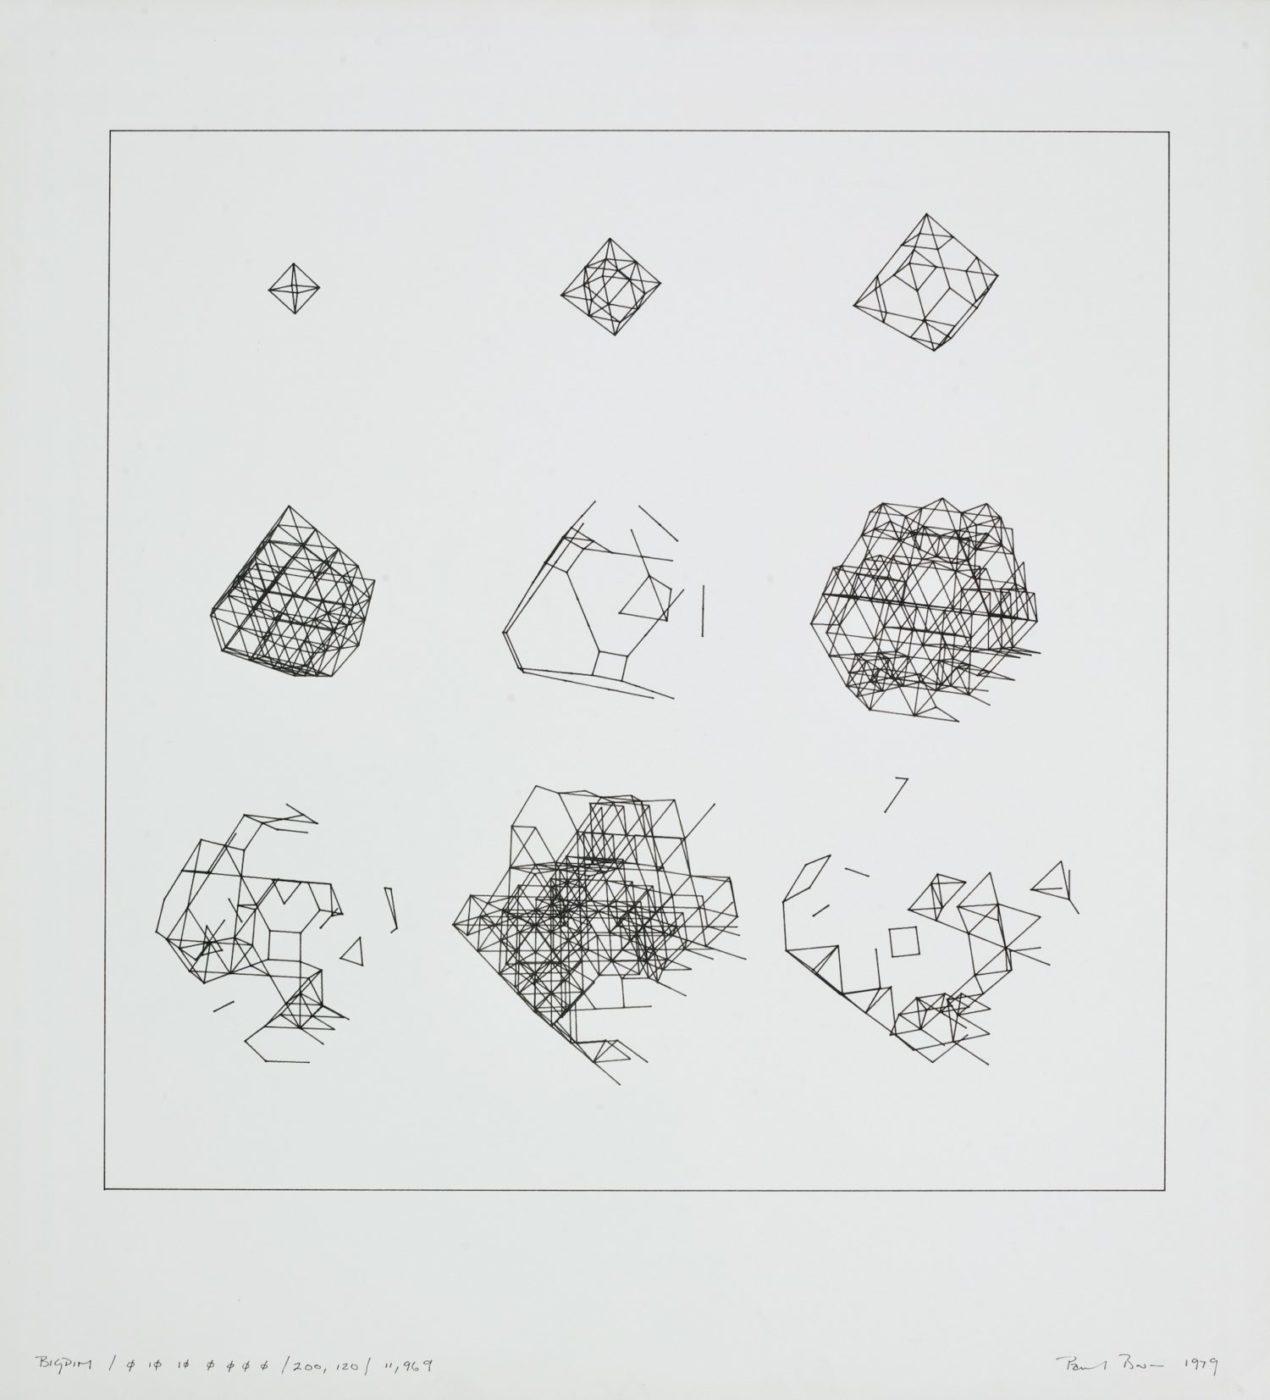 Paul Brown, Bigdim, plotter drawing, ink on paper, 1969